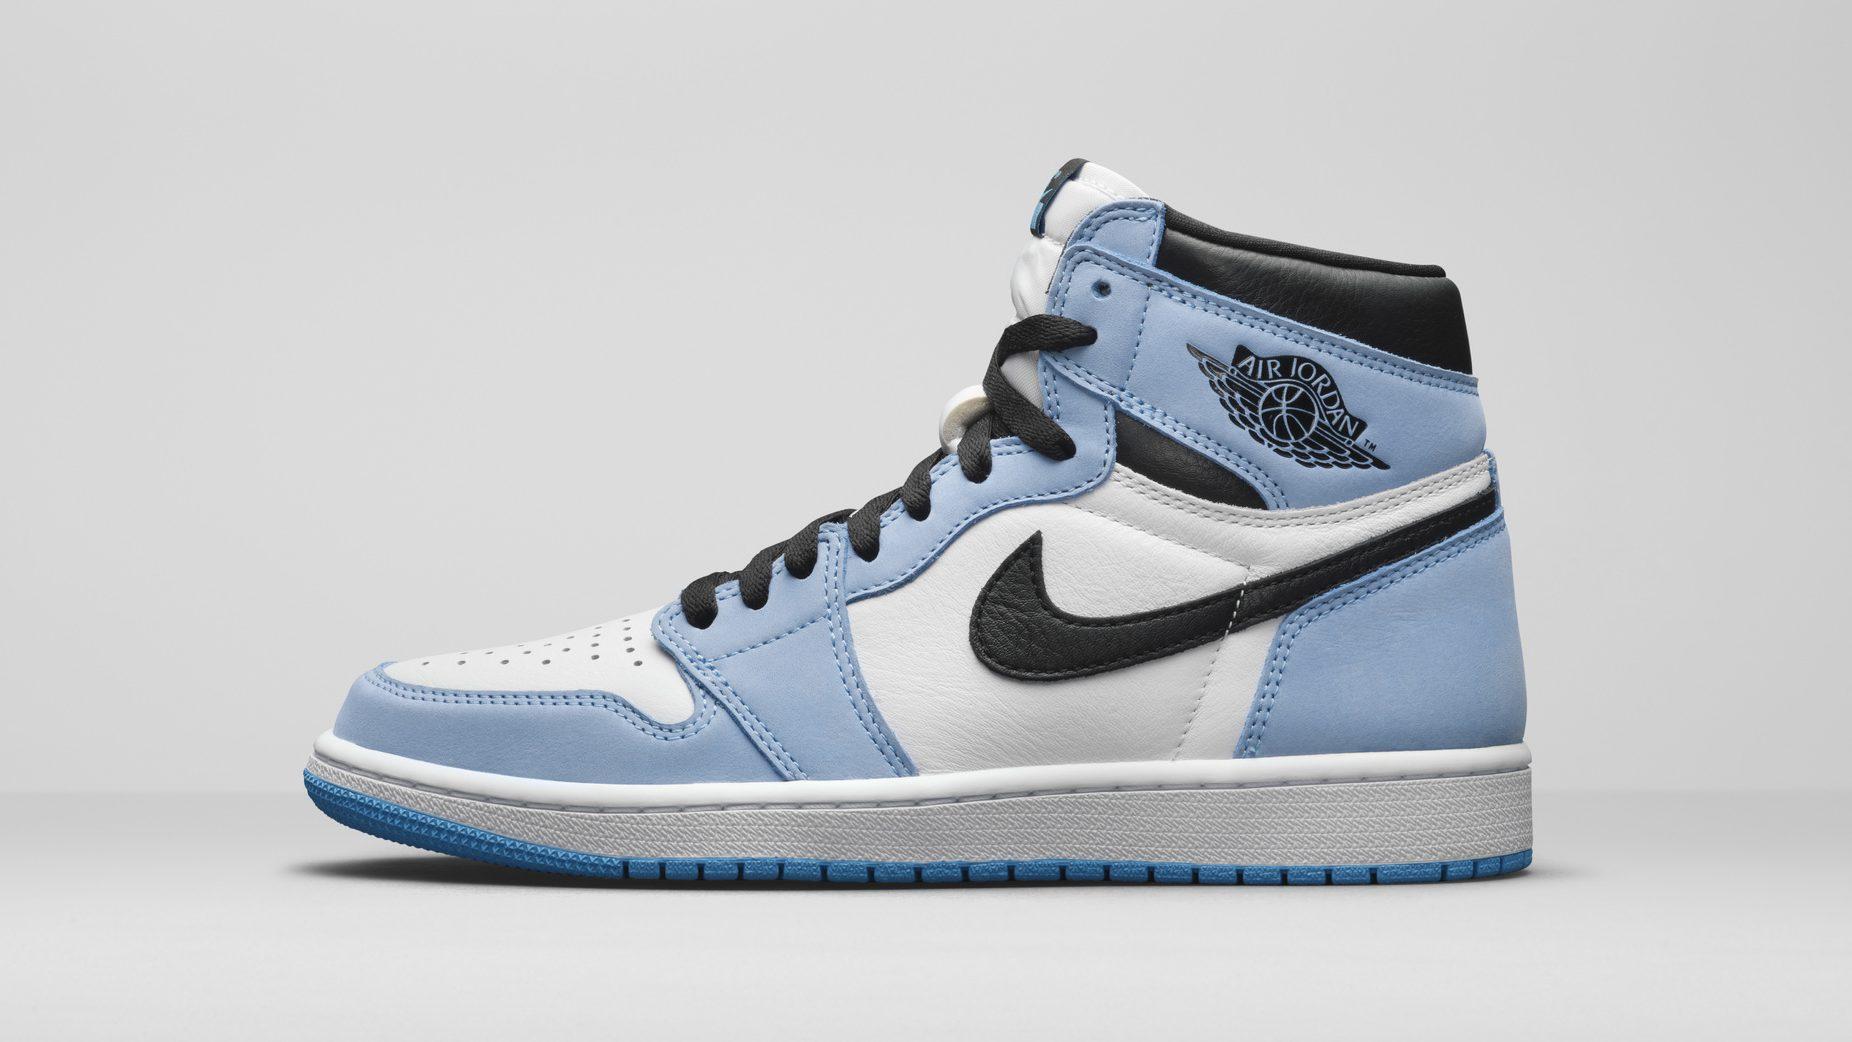 Air Jordans for Spring 2021 Revealed